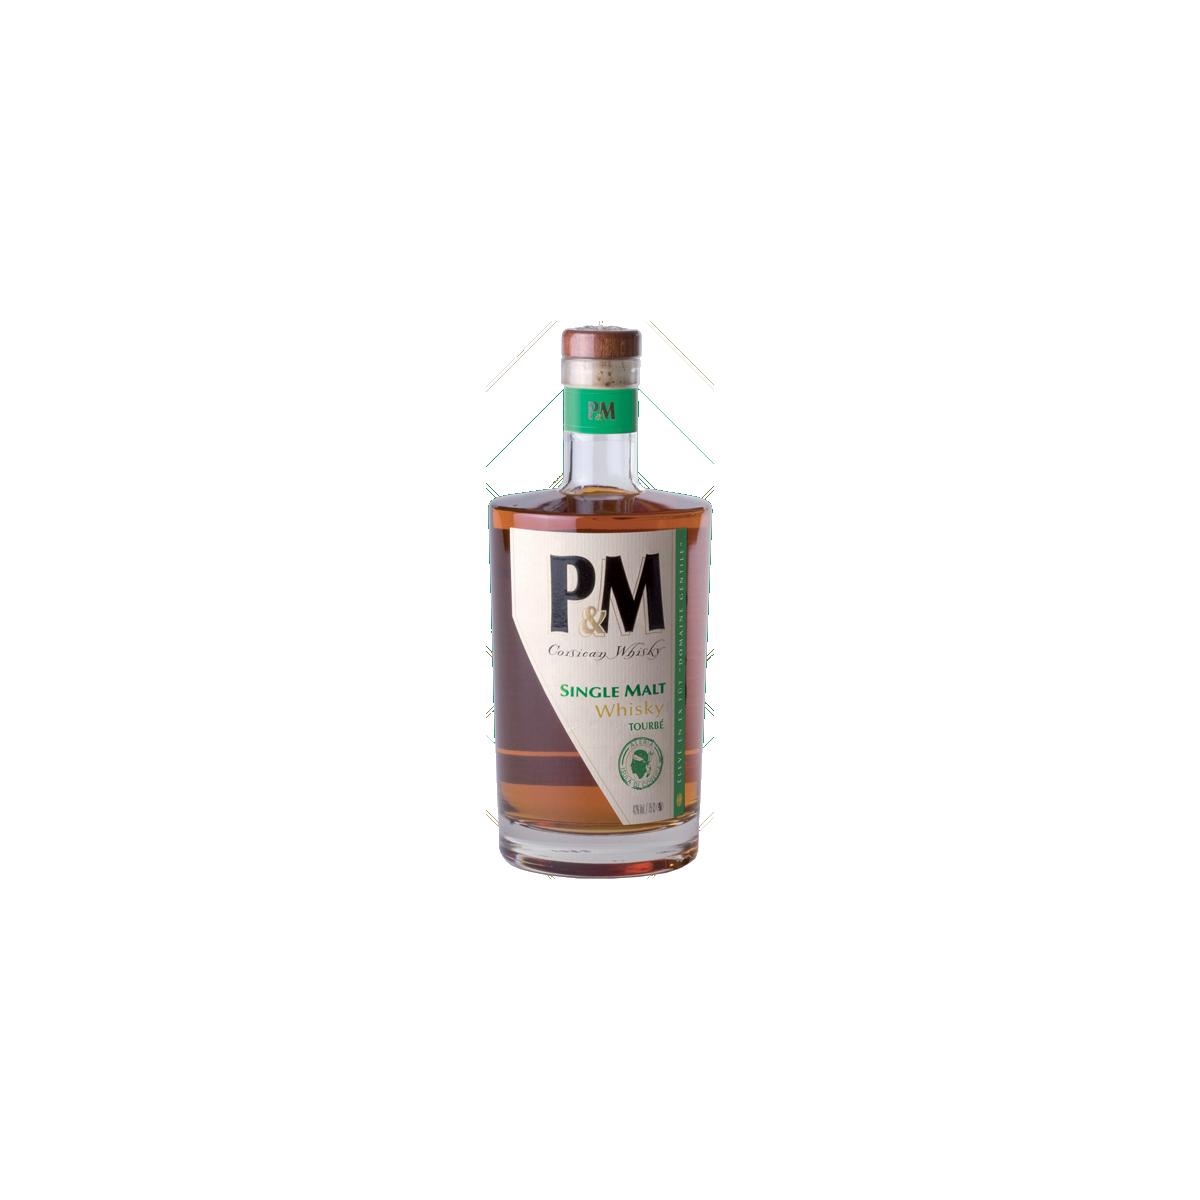 P&M Single Malt Tourbé Whisky 42%